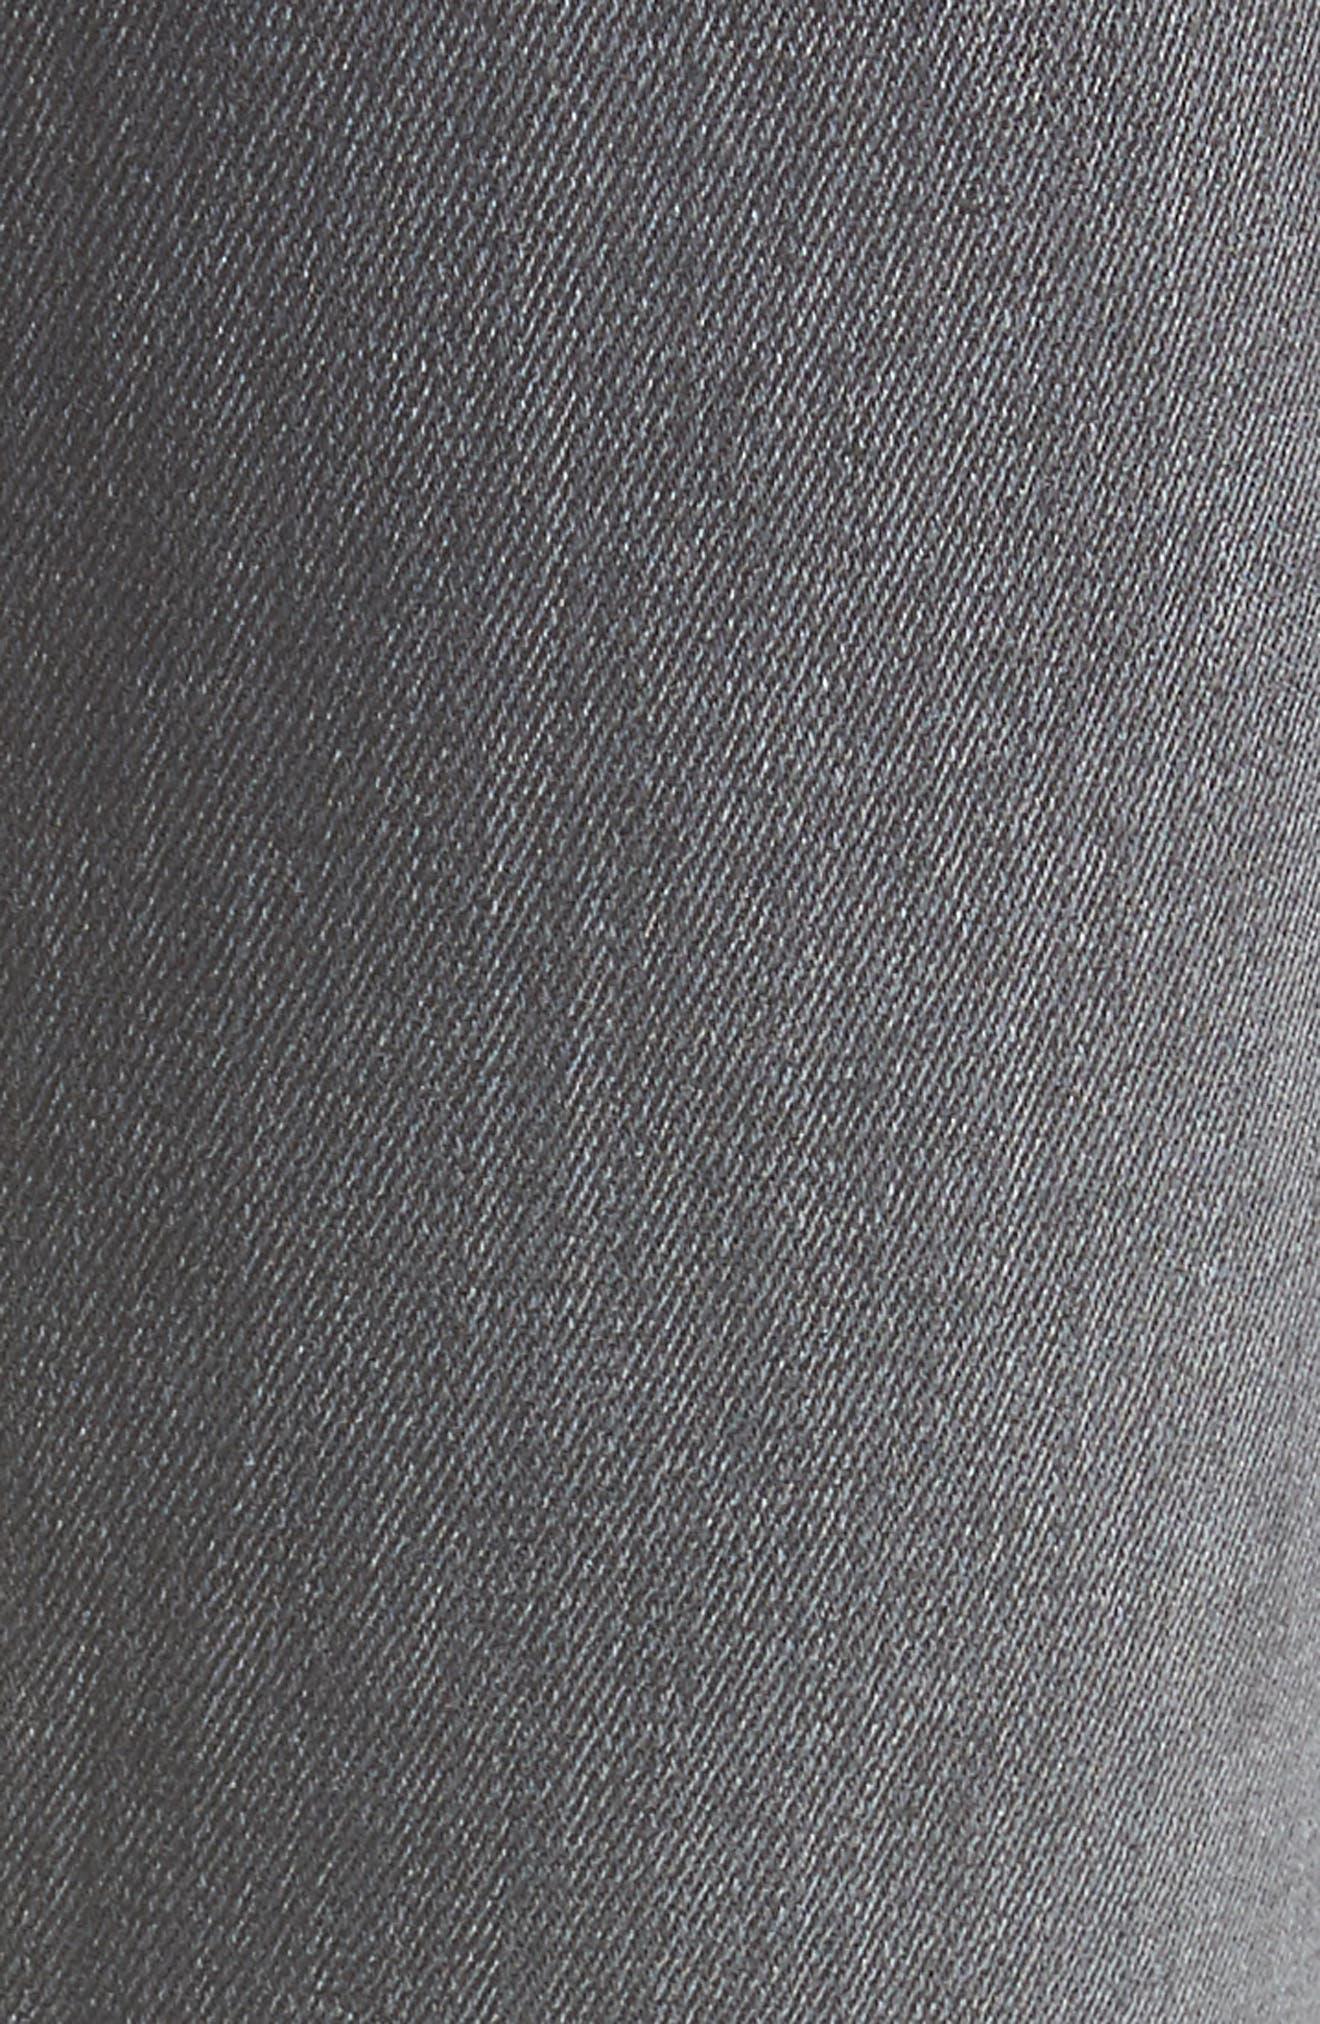 Emma Power Legging Jeans,                             Alternate thumbnail 5, color,